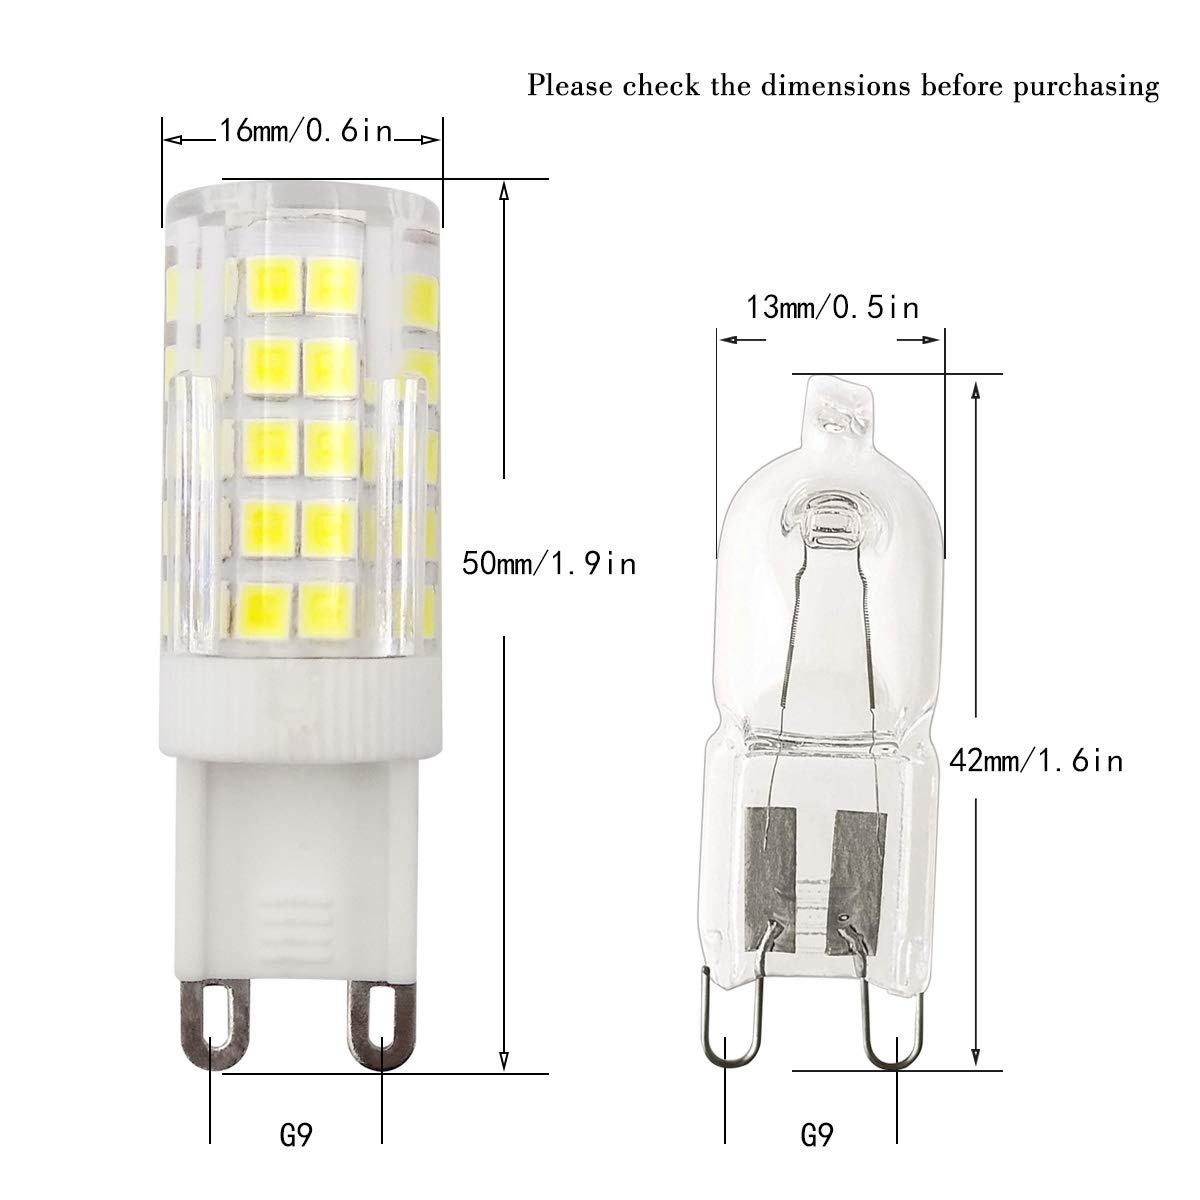 ZHENMING G9 LED Light Bulbs Warm White Dimmable G9 Base G9 Bulbs for Home Lighting G9 Bin-pin Base Pack of 5 450LM,Warm White 3000K AC 110V 5W Equivalent 50W Halogen